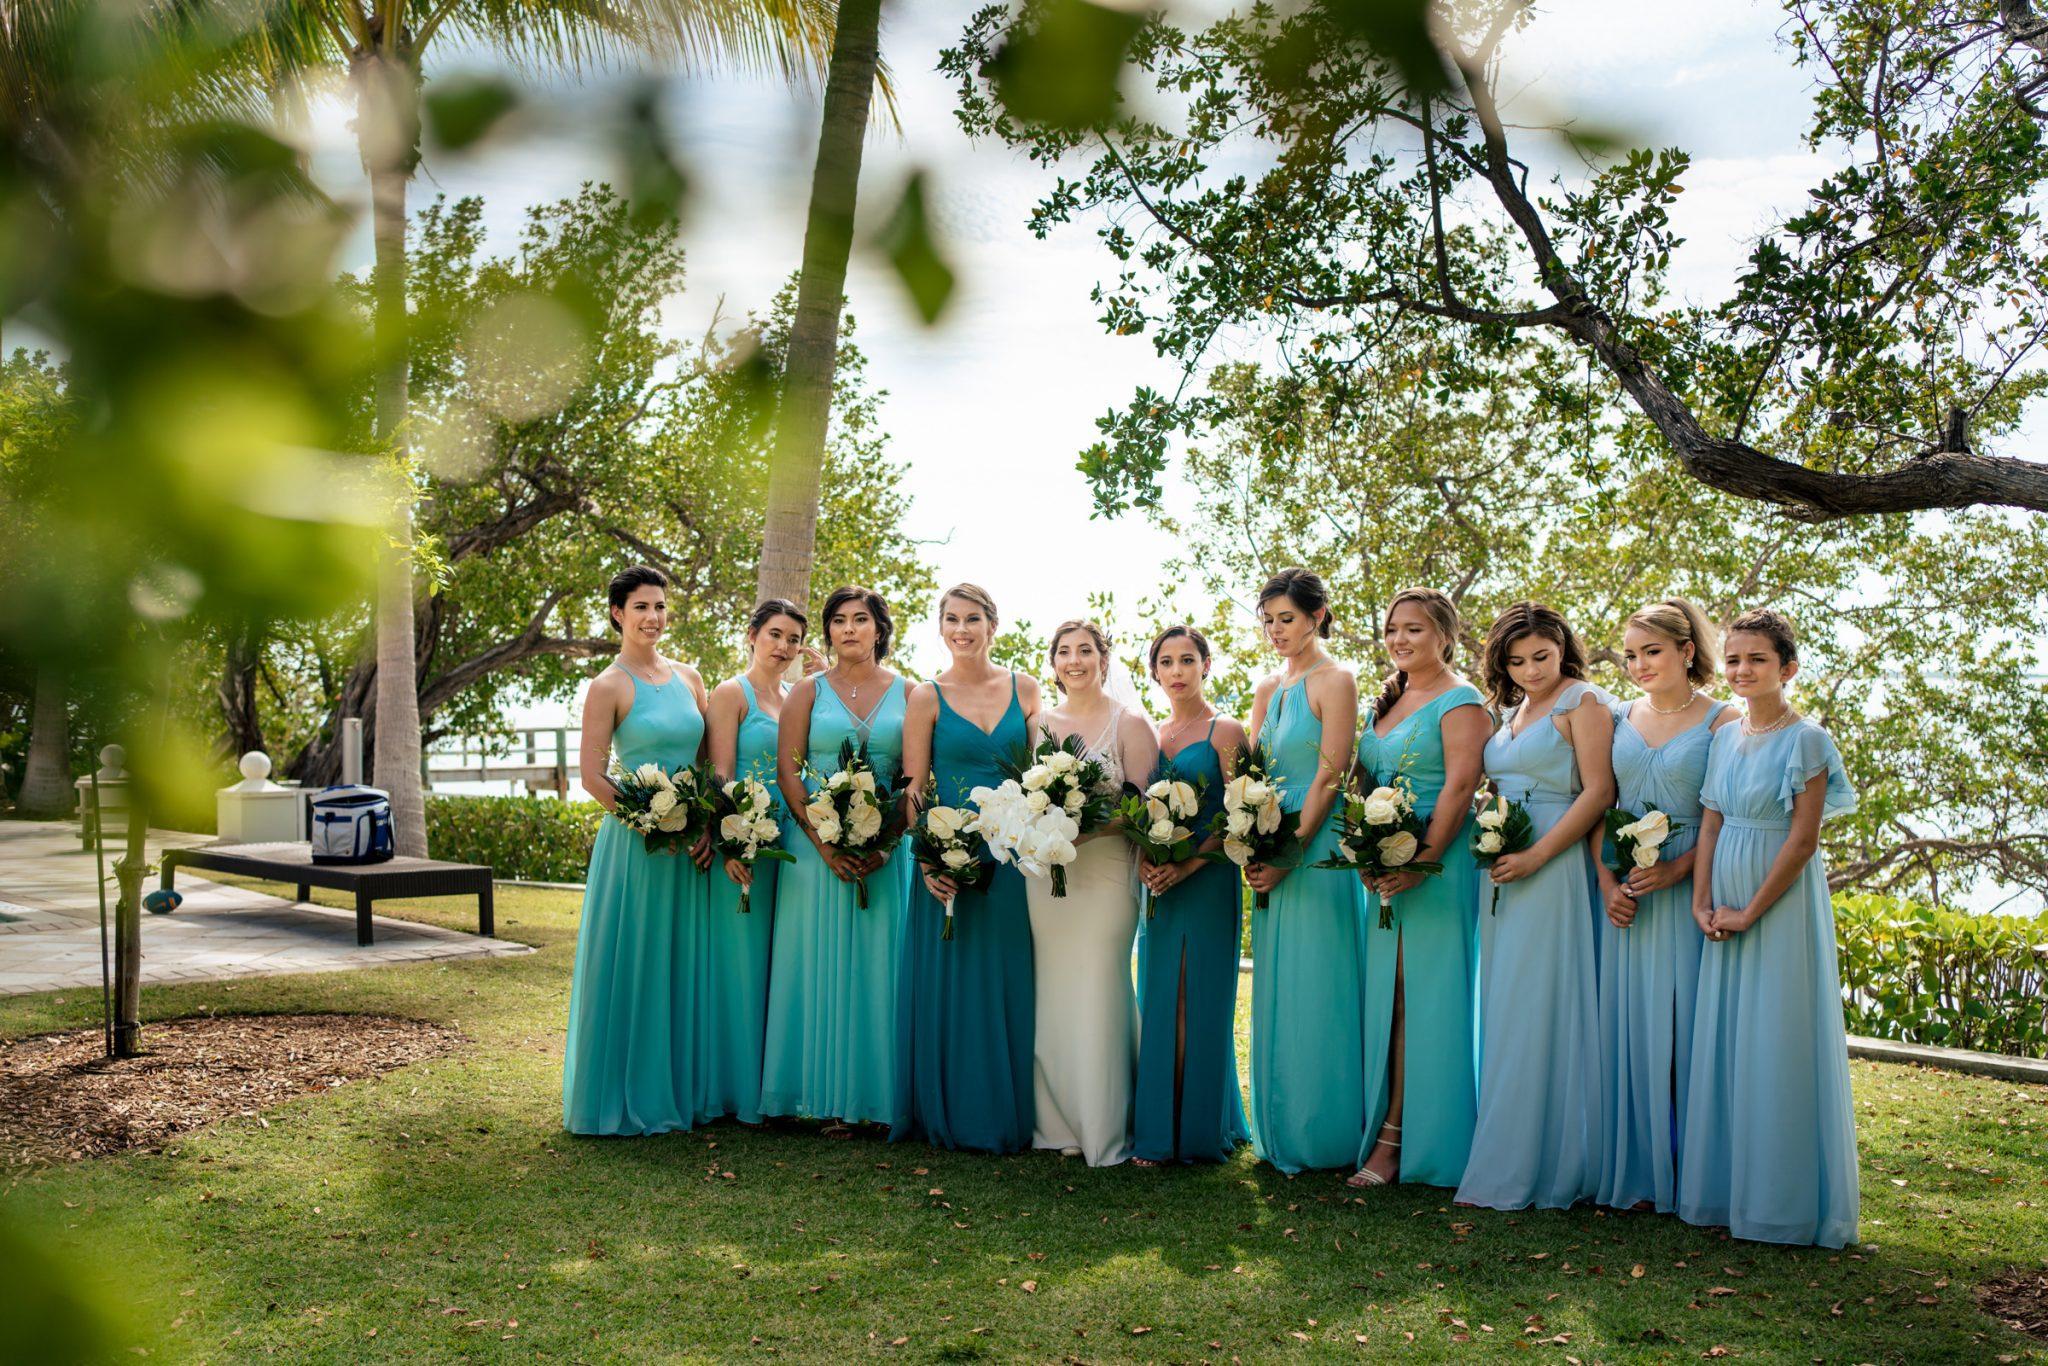 bridesmaids and bride posing for photo waterfront playa largo resort wedding